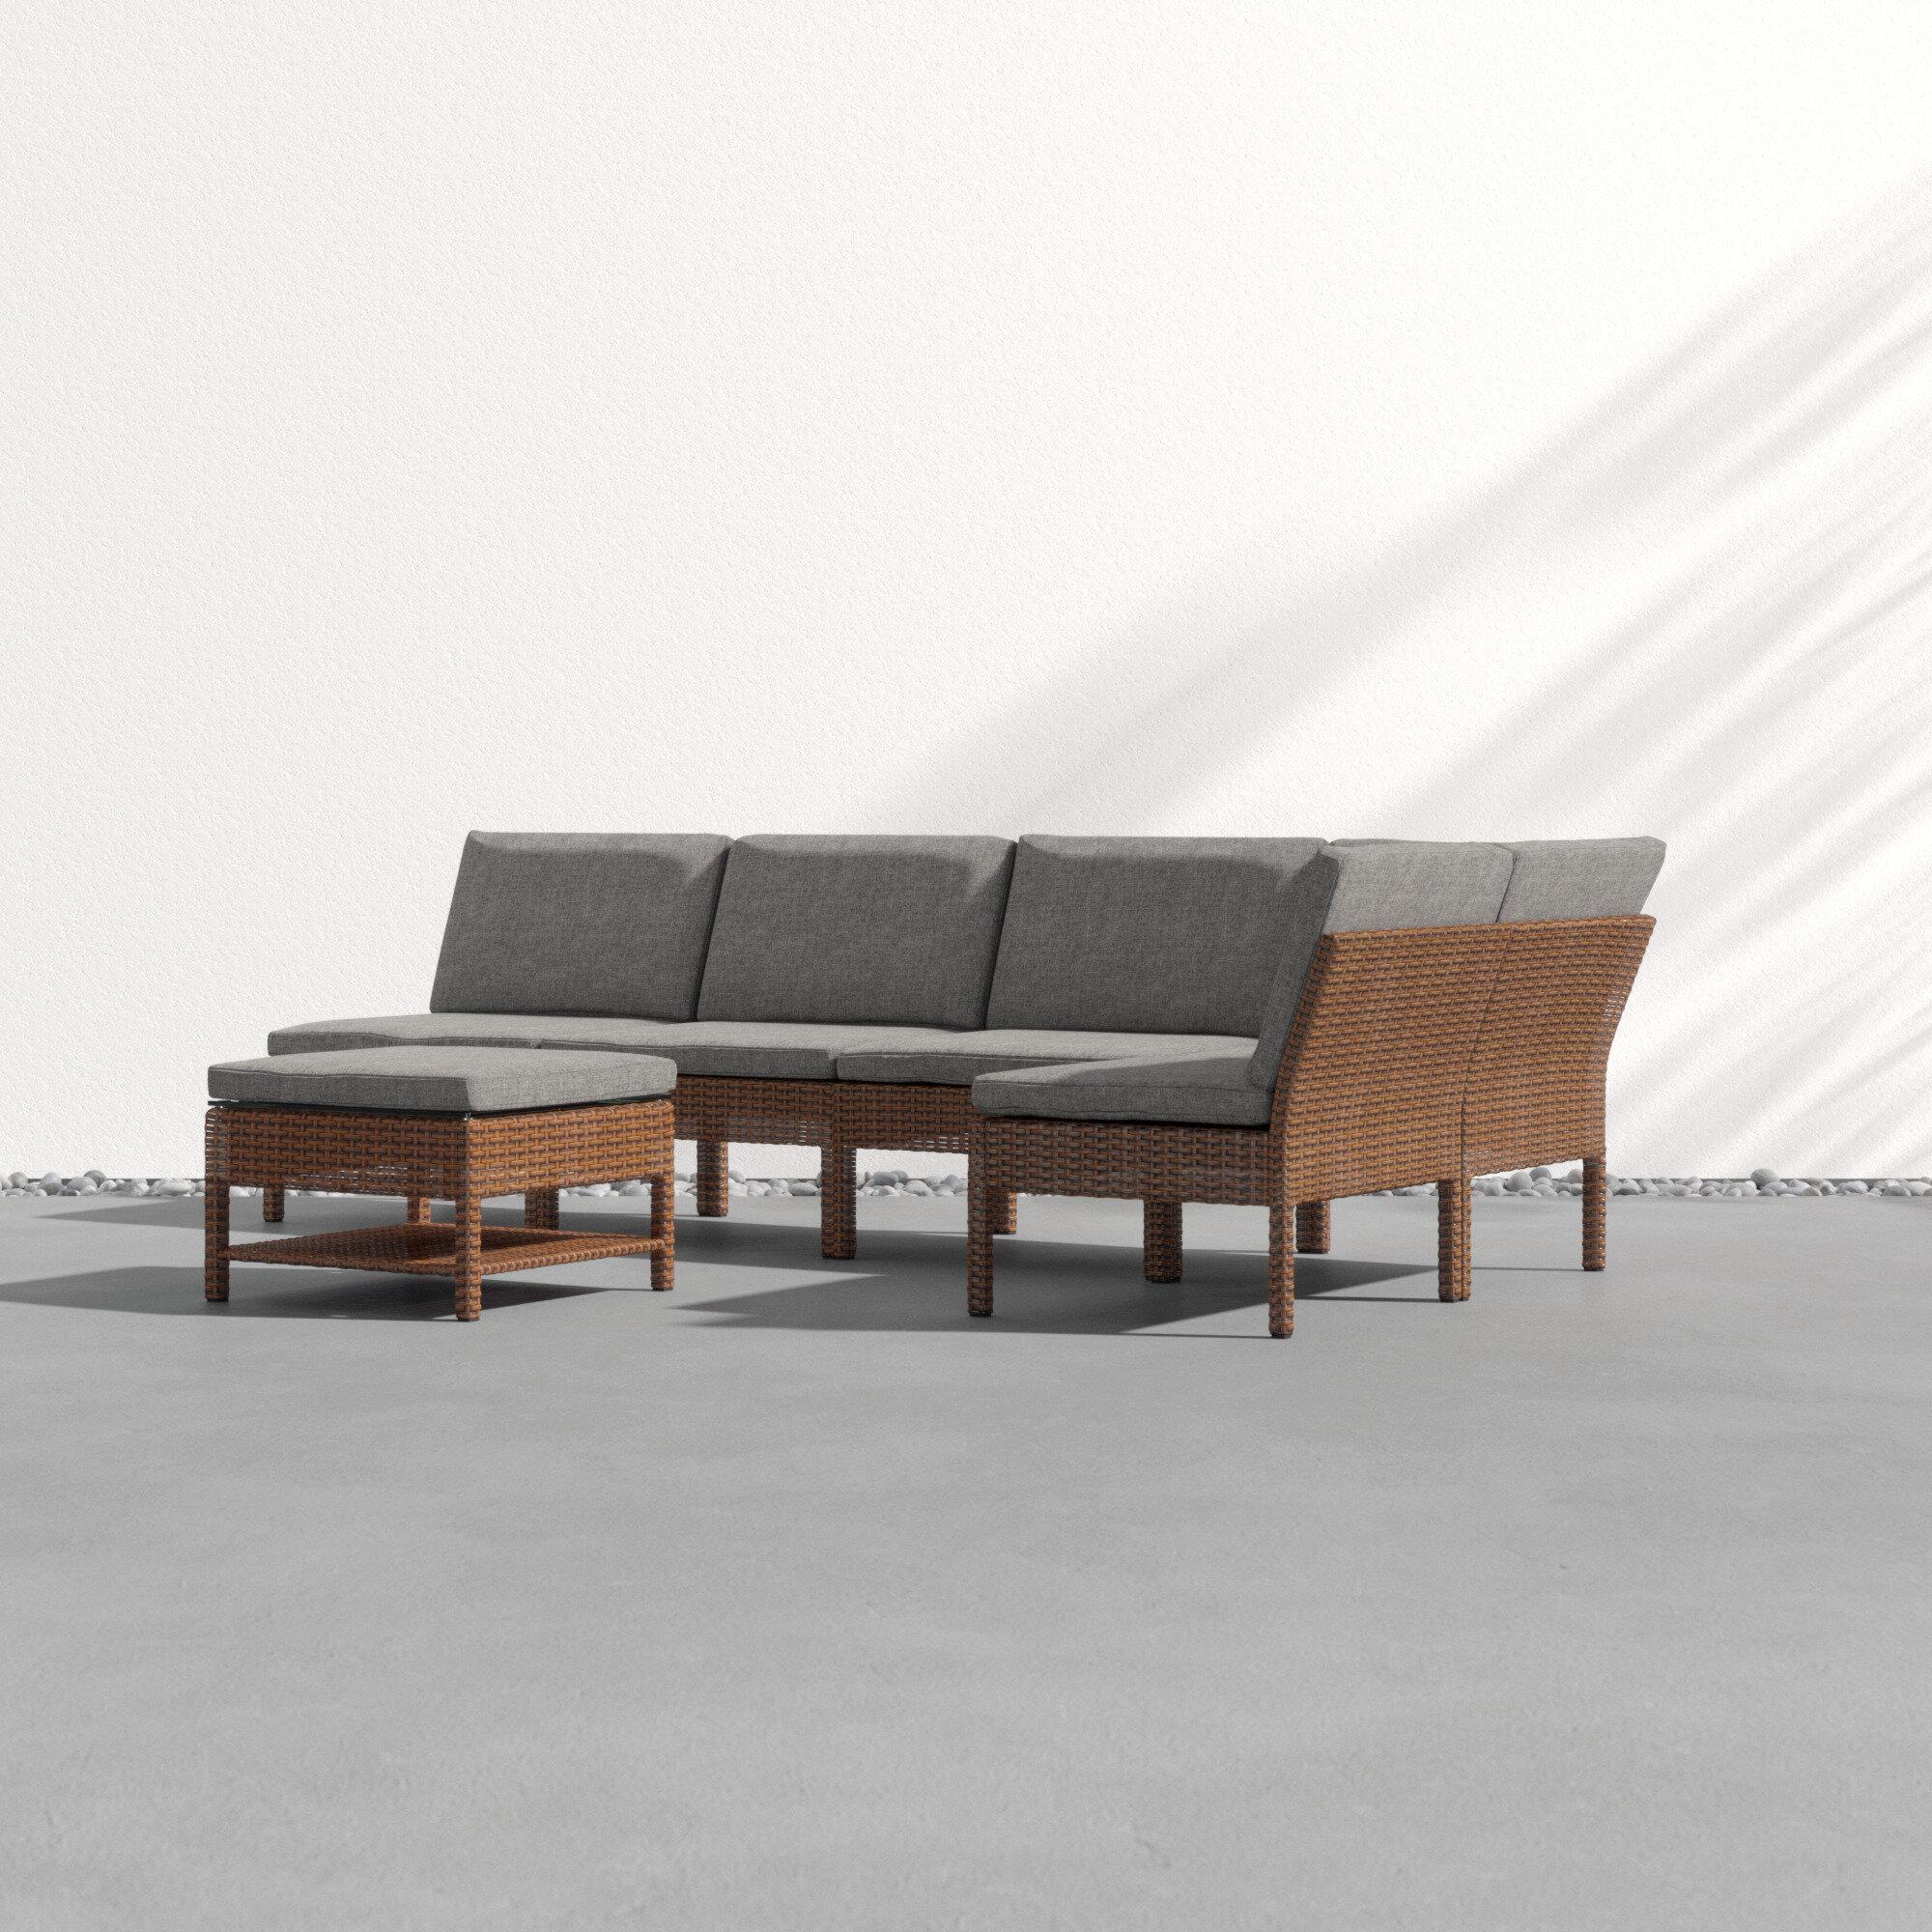 Peachy Maryann Patio Garden 6 Piece Sectional Seating Group With Cushions Uwap Interior Chair Design Uwaporg